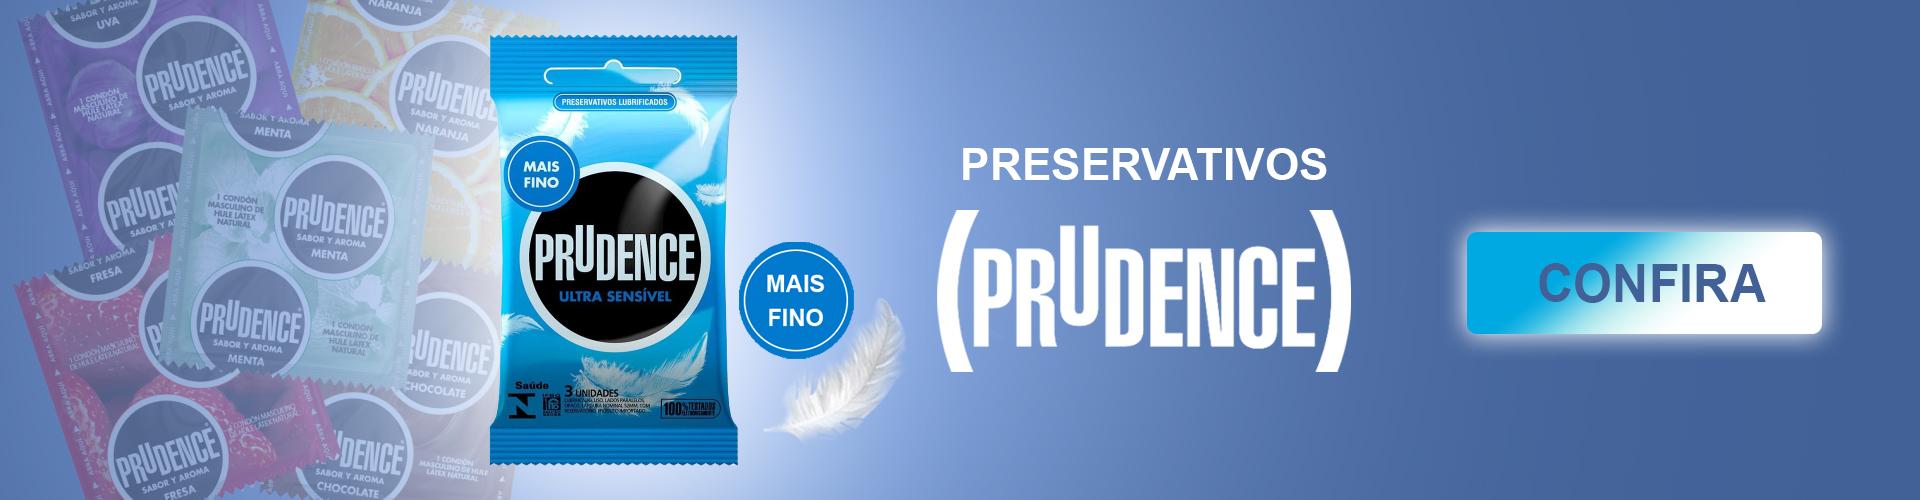 Preservativos prudence compre ja o seu!